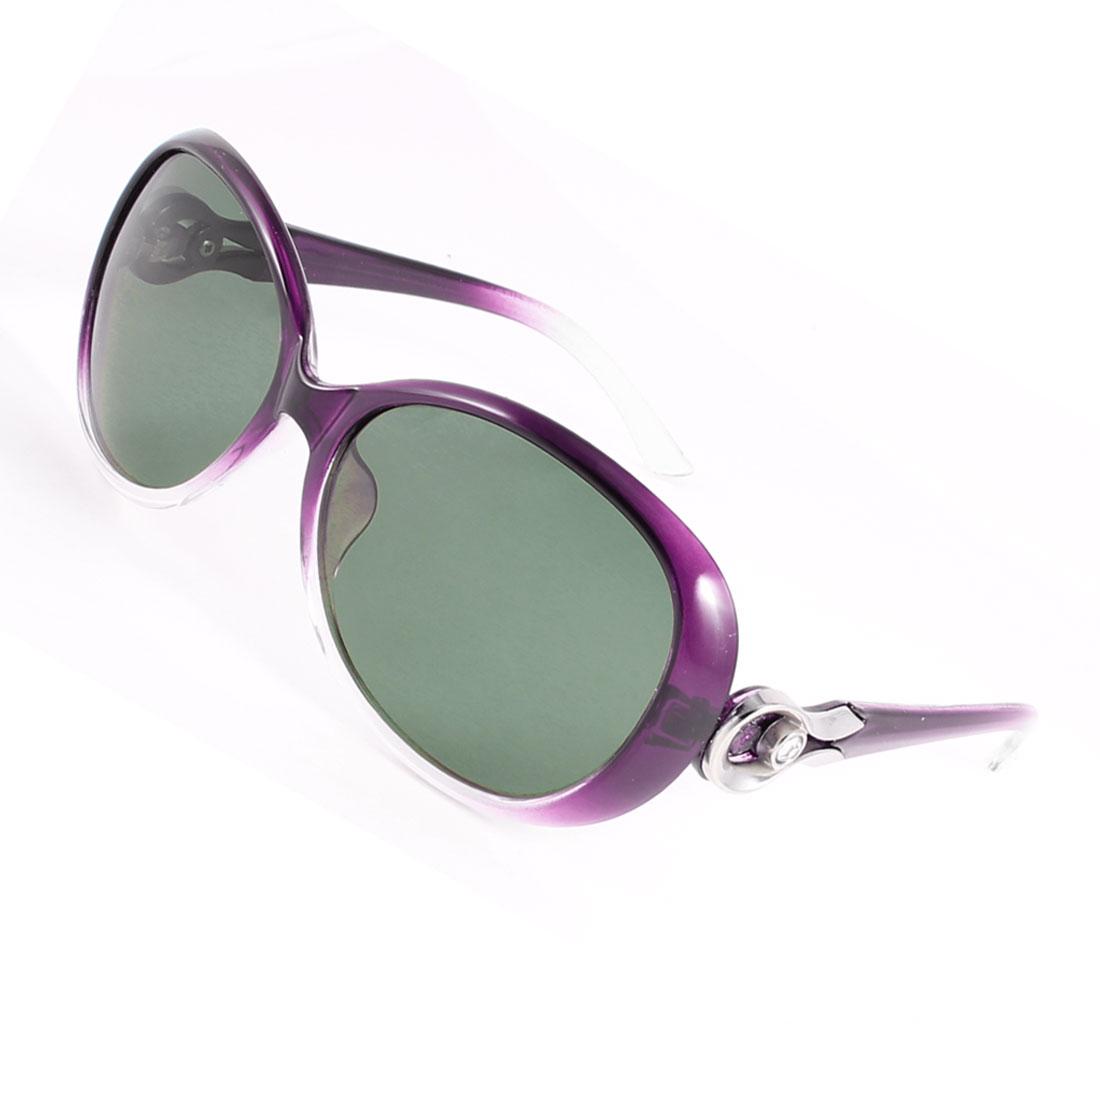 Driving Woman Red Plastic Rhinestone Decor Arms Single Bridge Polarized Sunglasses